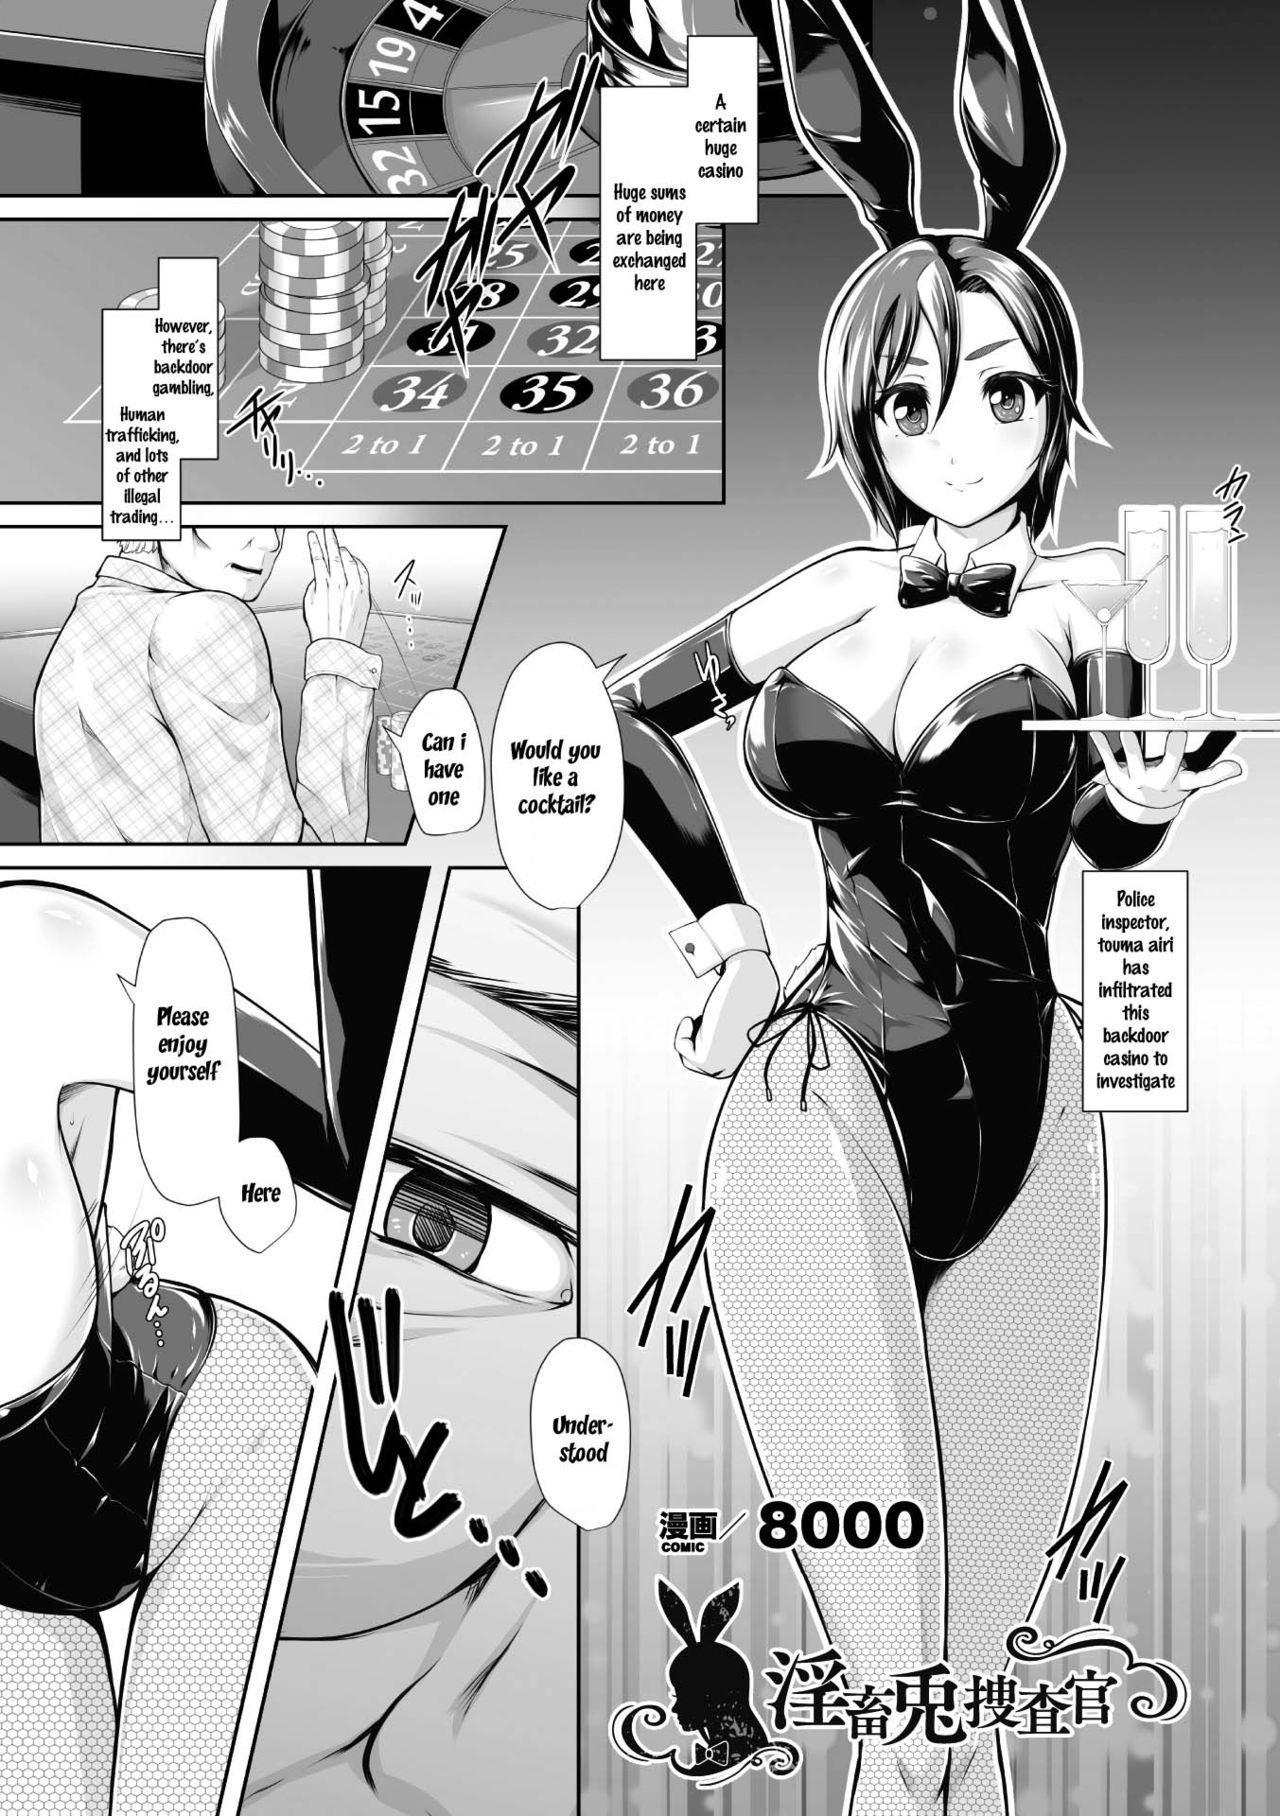 2D Comic Magazine Waki Fechi Bunny Girl Vol.1 Ch 1-3 4